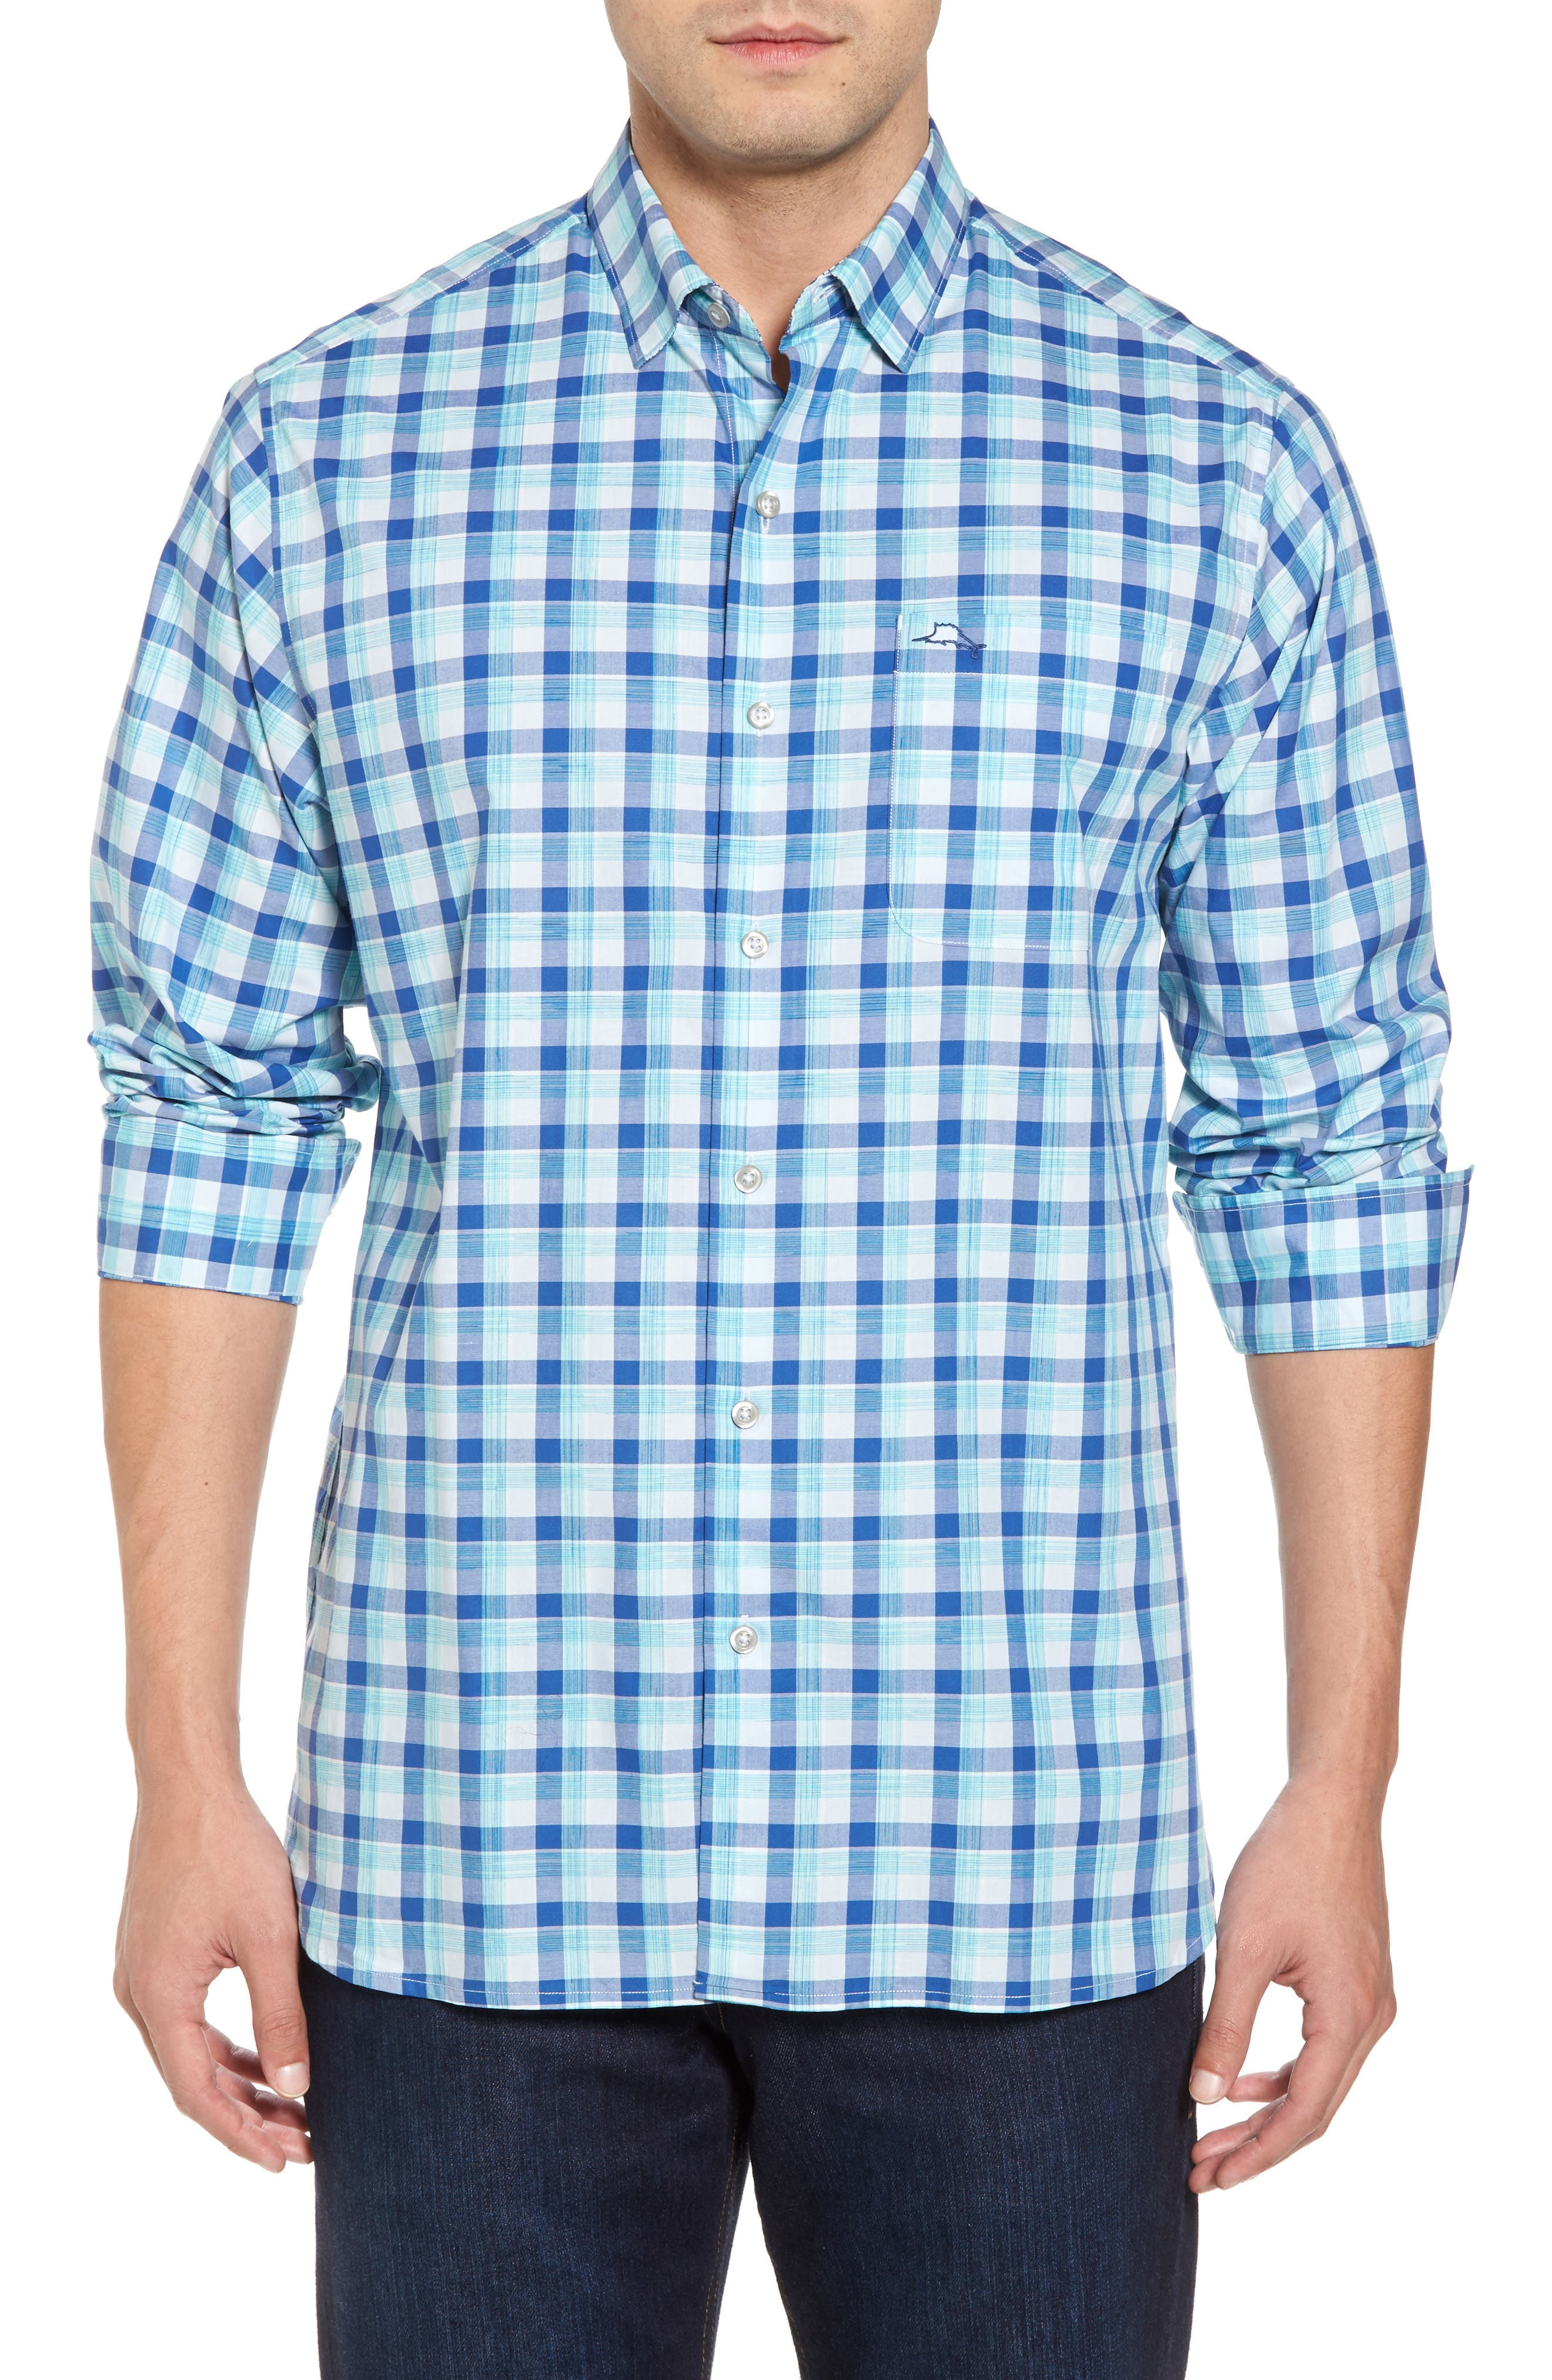 Alternate Image 1 Selected - Tommy Bahama Atlantic Tides Classic Fit Plaid Sport Shirt